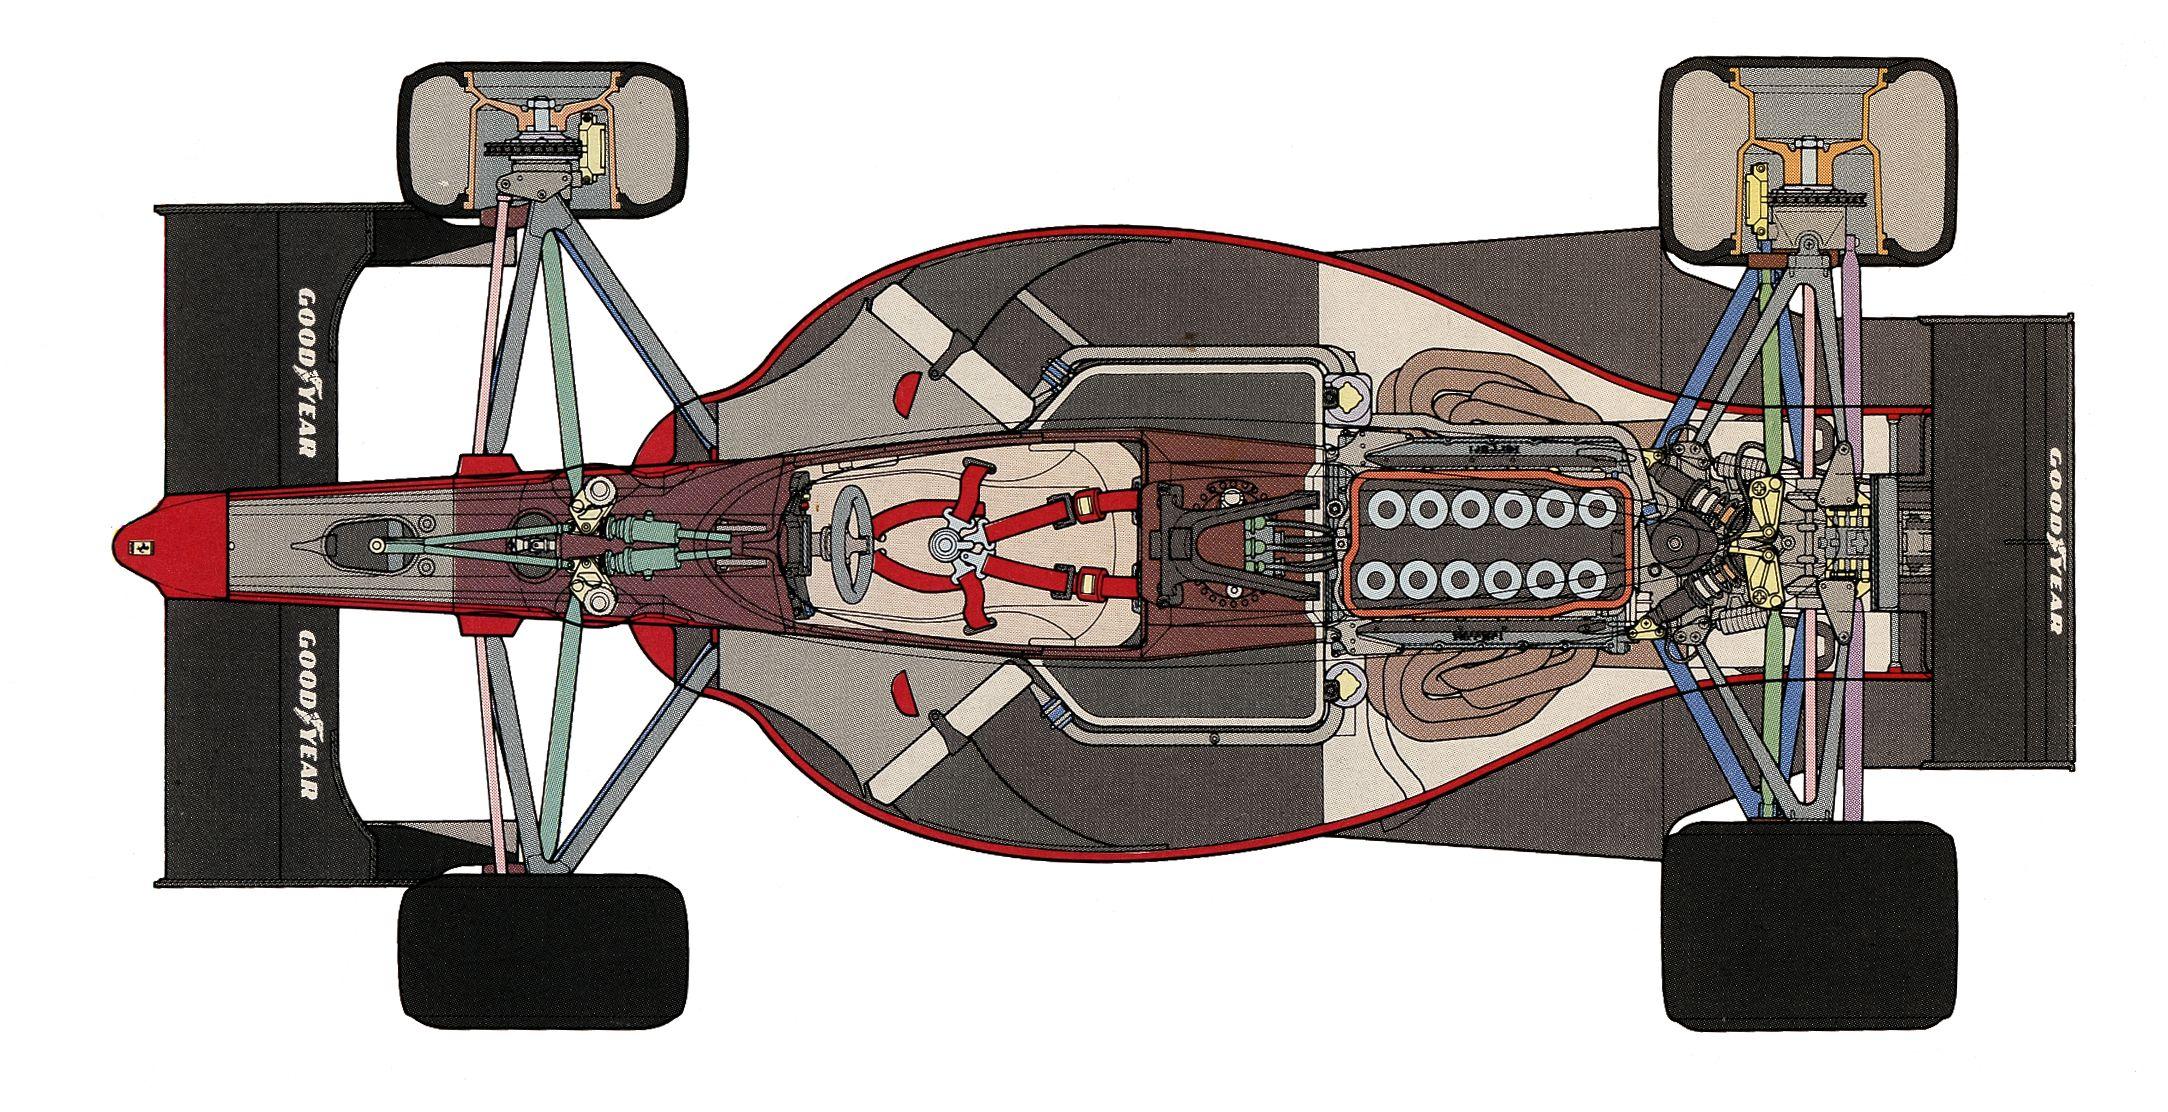 Ferrari 641 Beautifully Designed by F1 Designer John